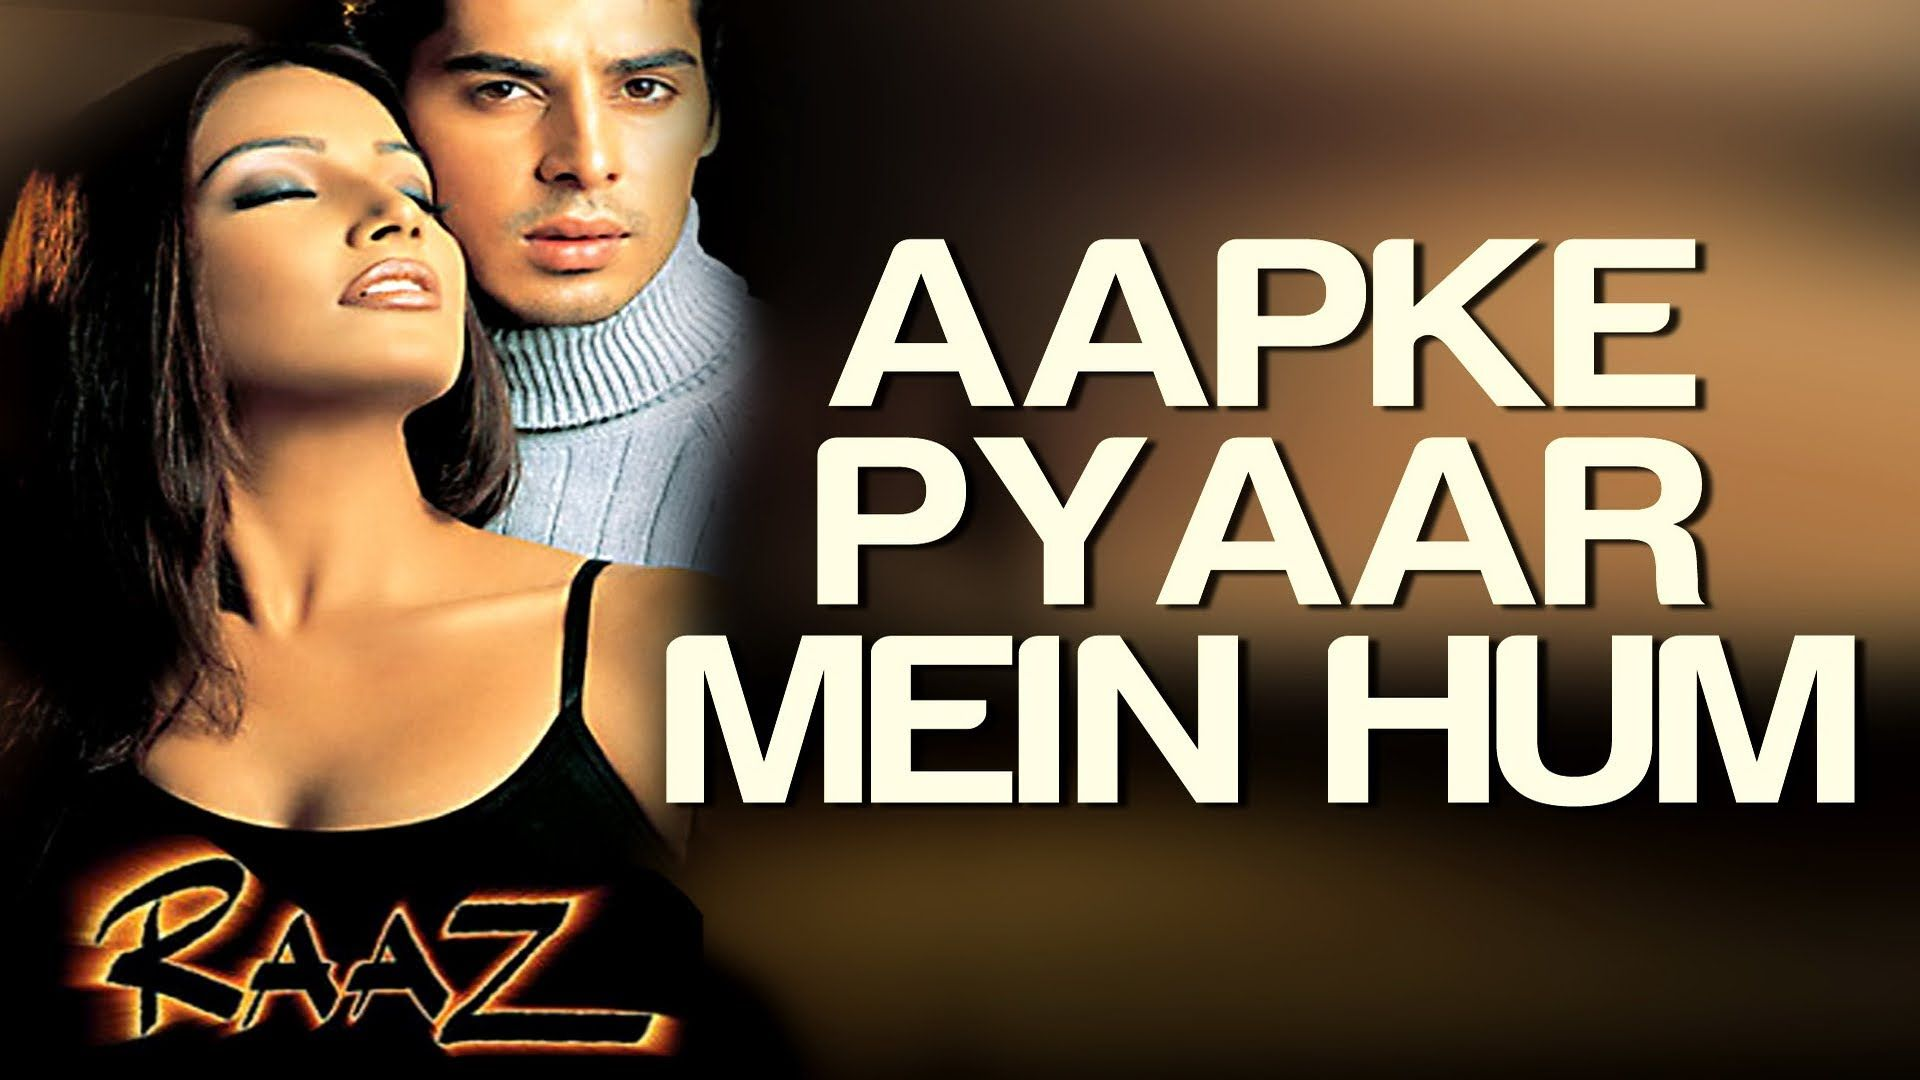 Aapke Pyaar Mein Hum Raaz Dino Morea Malini Sharma Alka Yagnik Latest Bollywood Songs Romantic Songs Hindi Movie Song